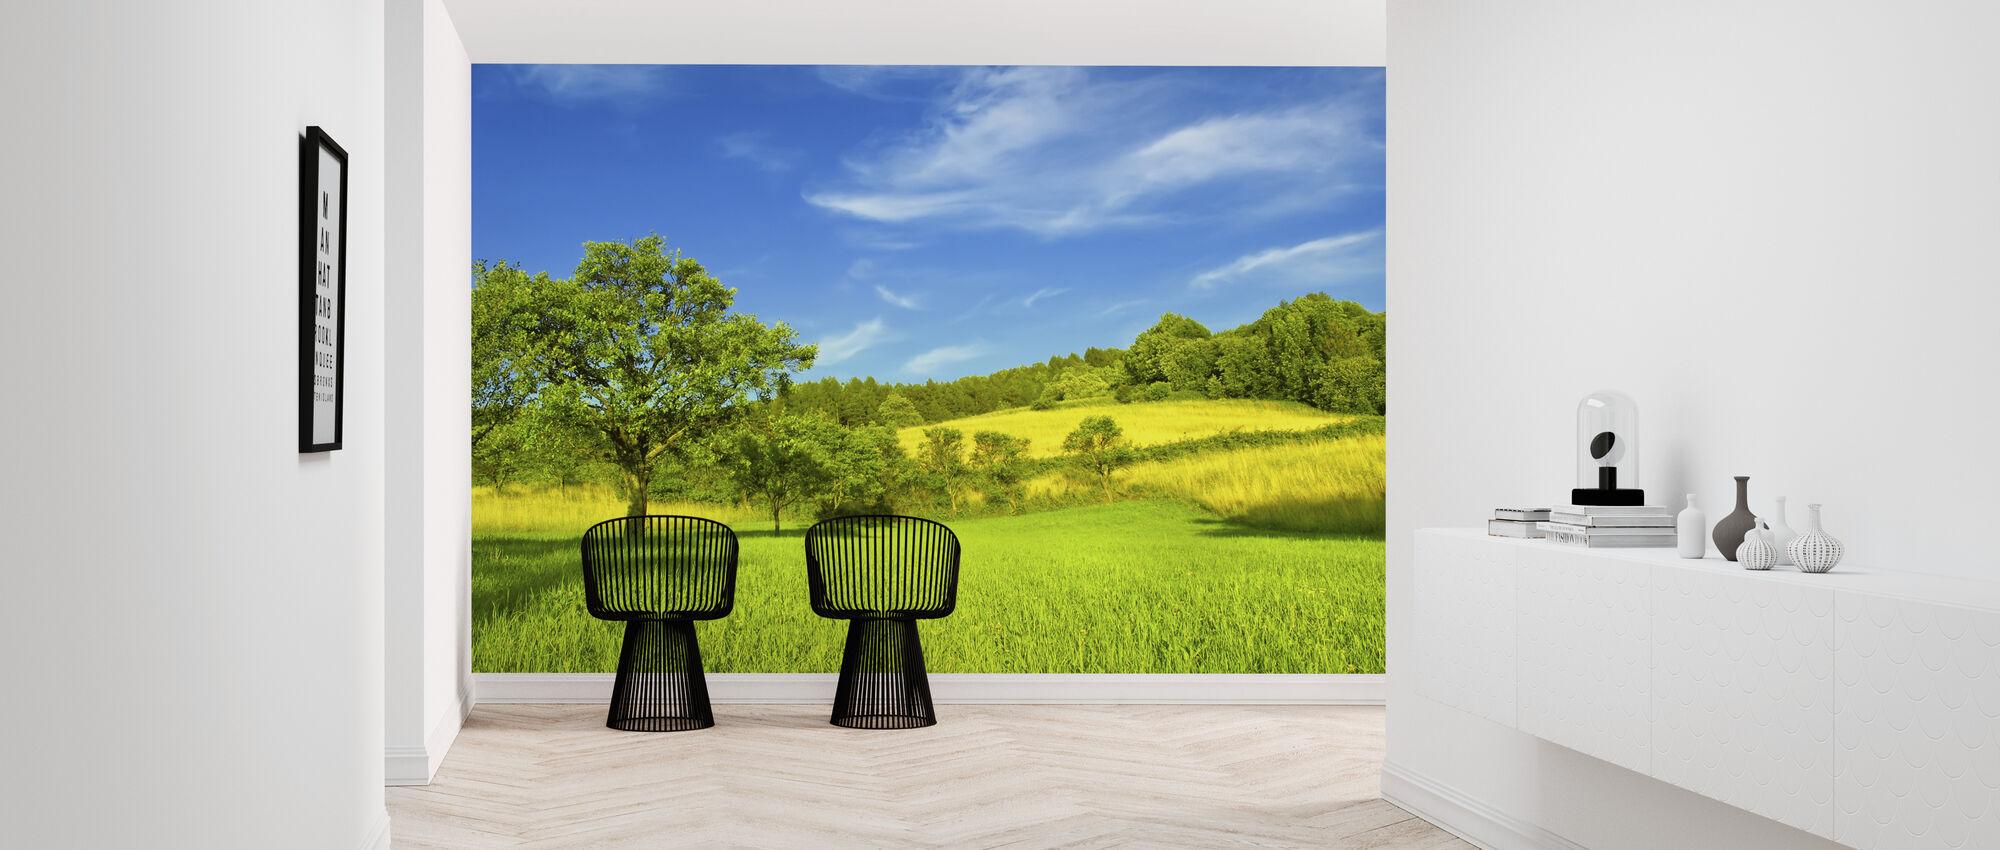 Sunny Summer Day - Wallpaper - Hallway